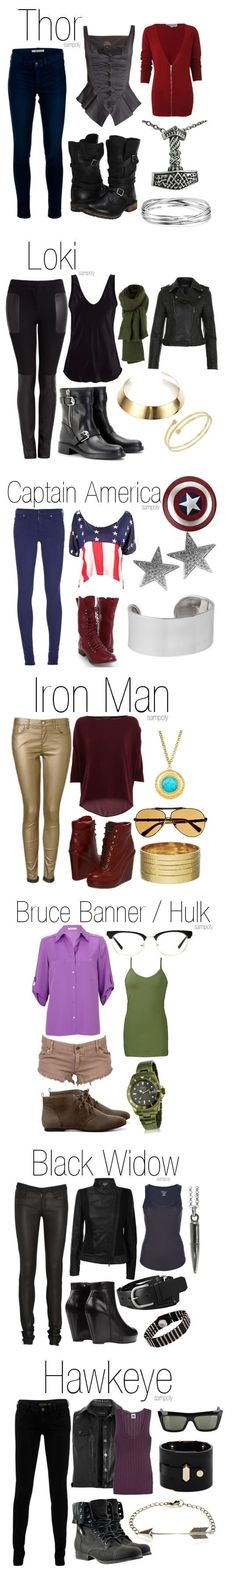 Avengers fashion I think I could make a better avengers wardrobe though